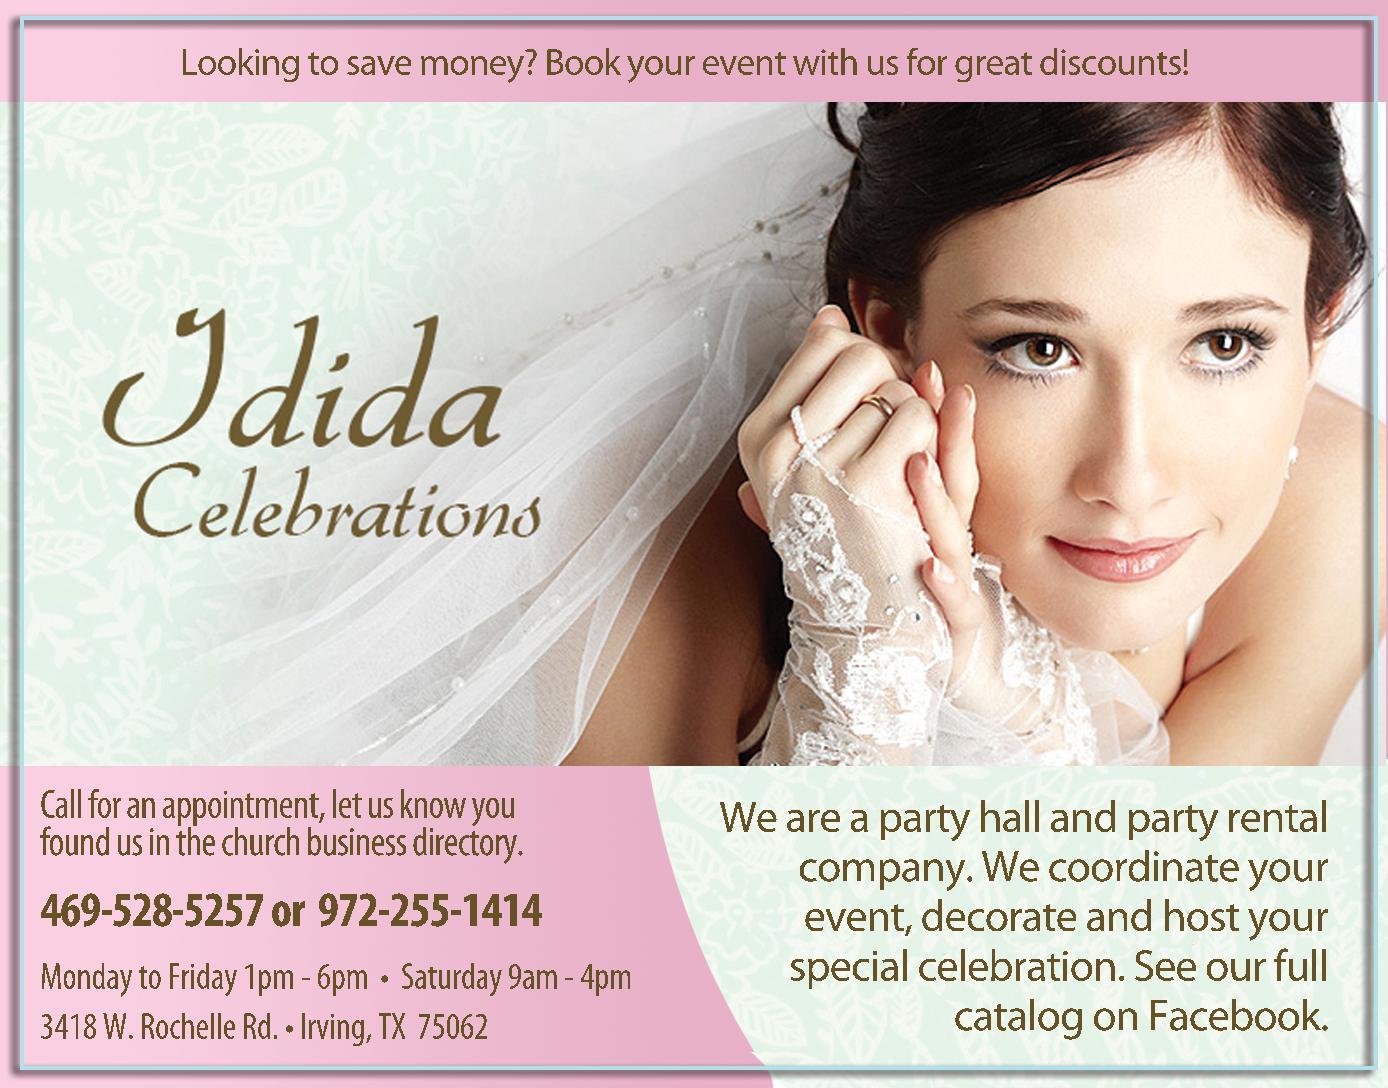 Idida Celebrations